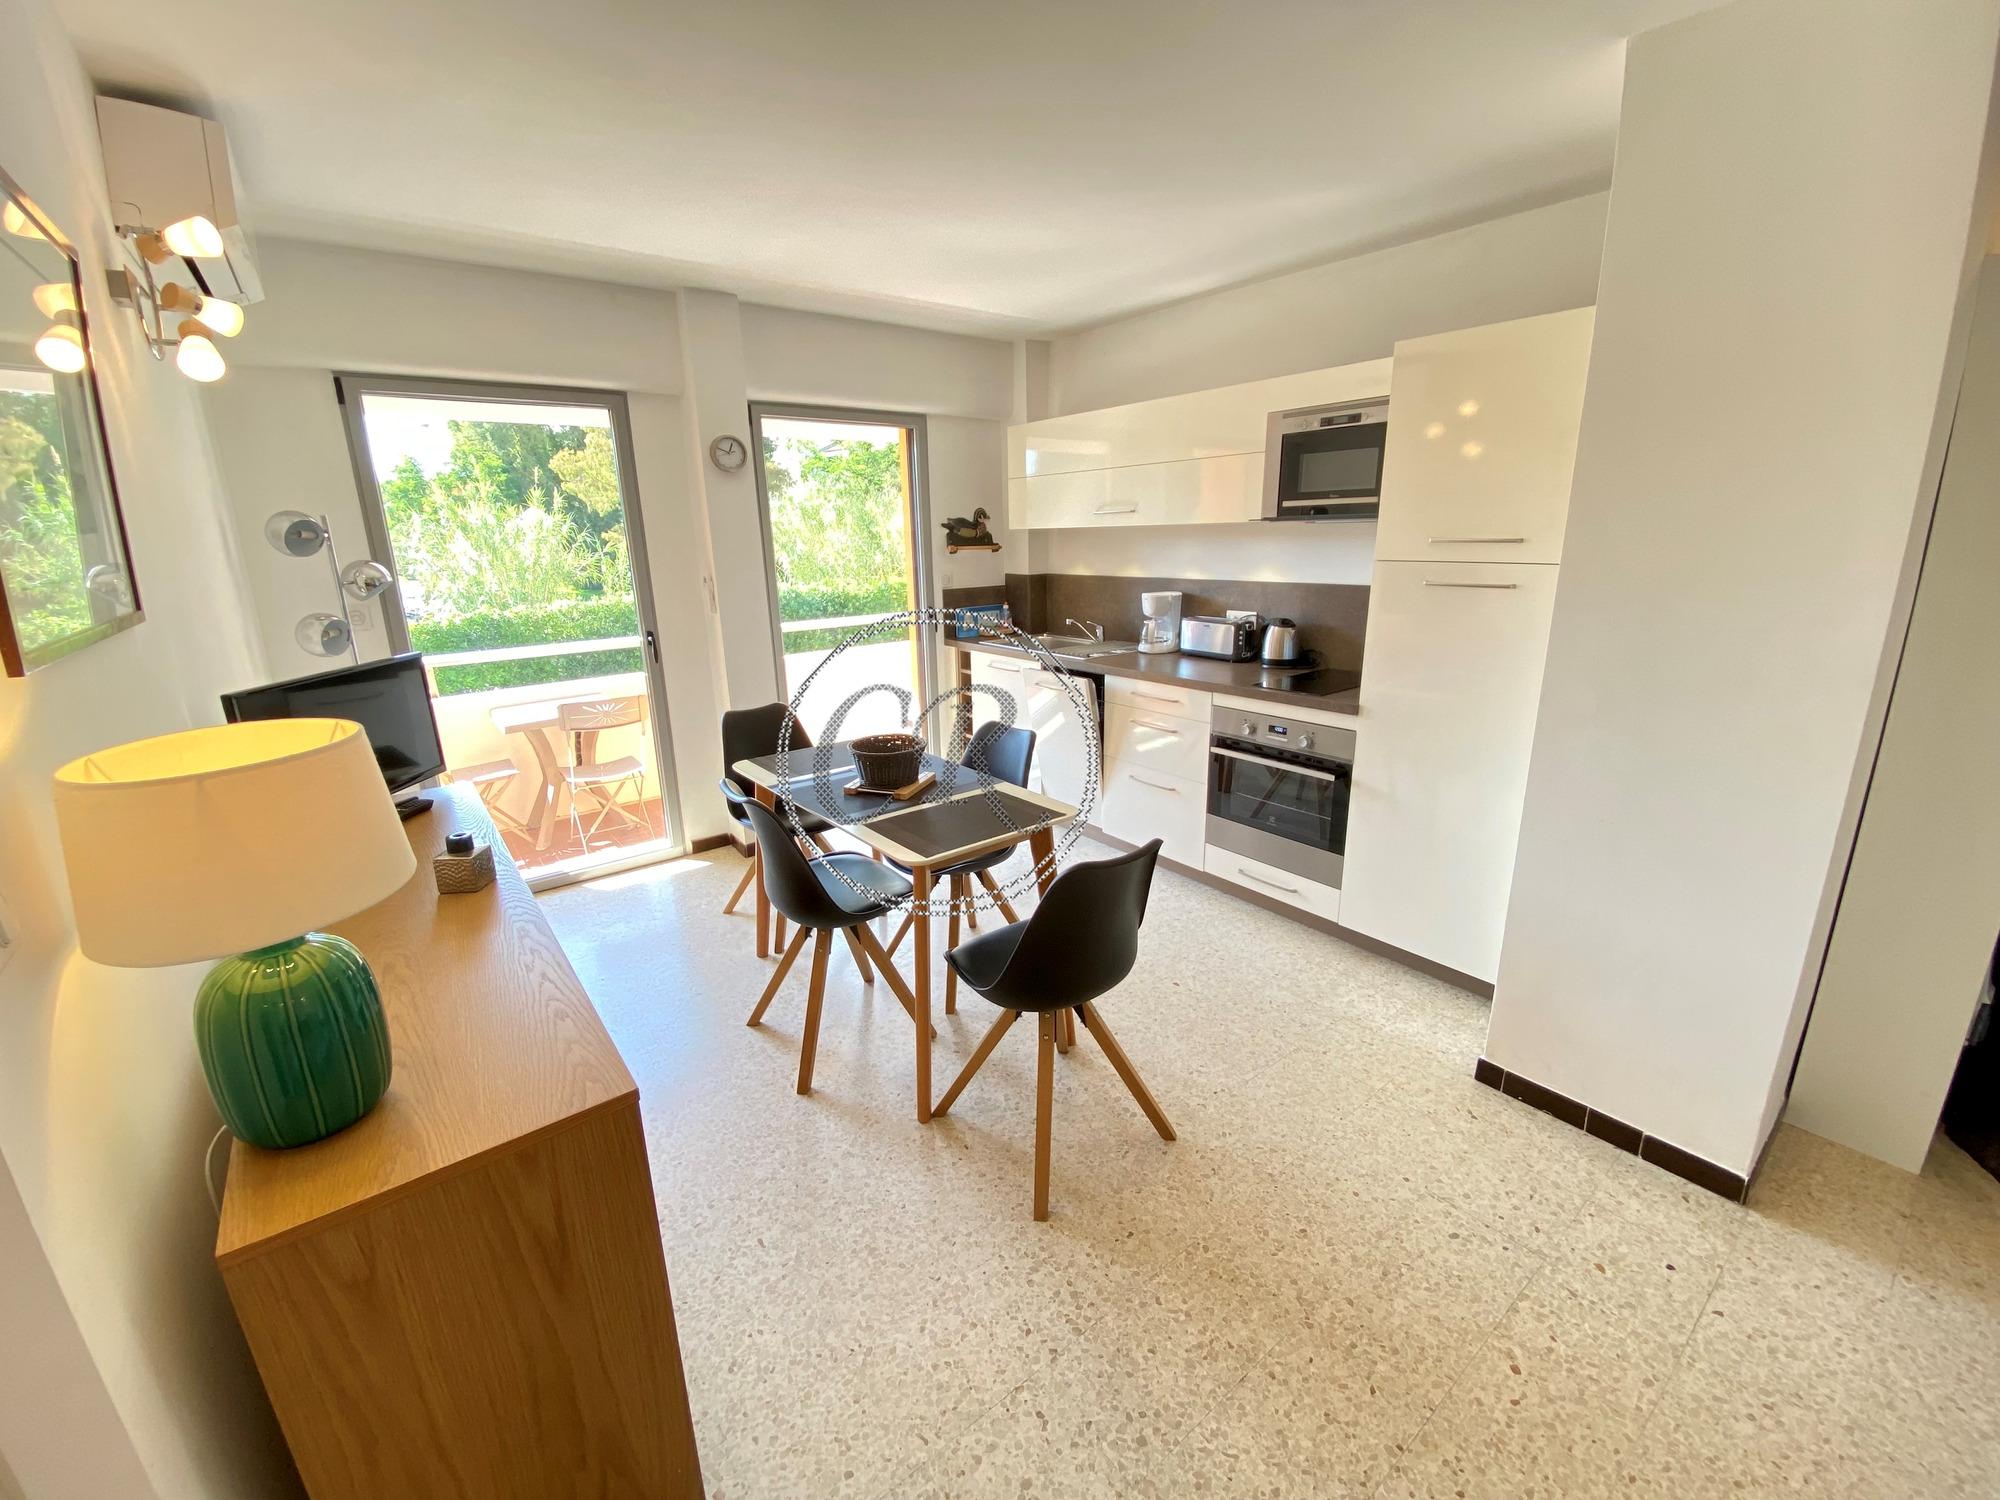 T2 apartment - 200 m from the Lavandou beach